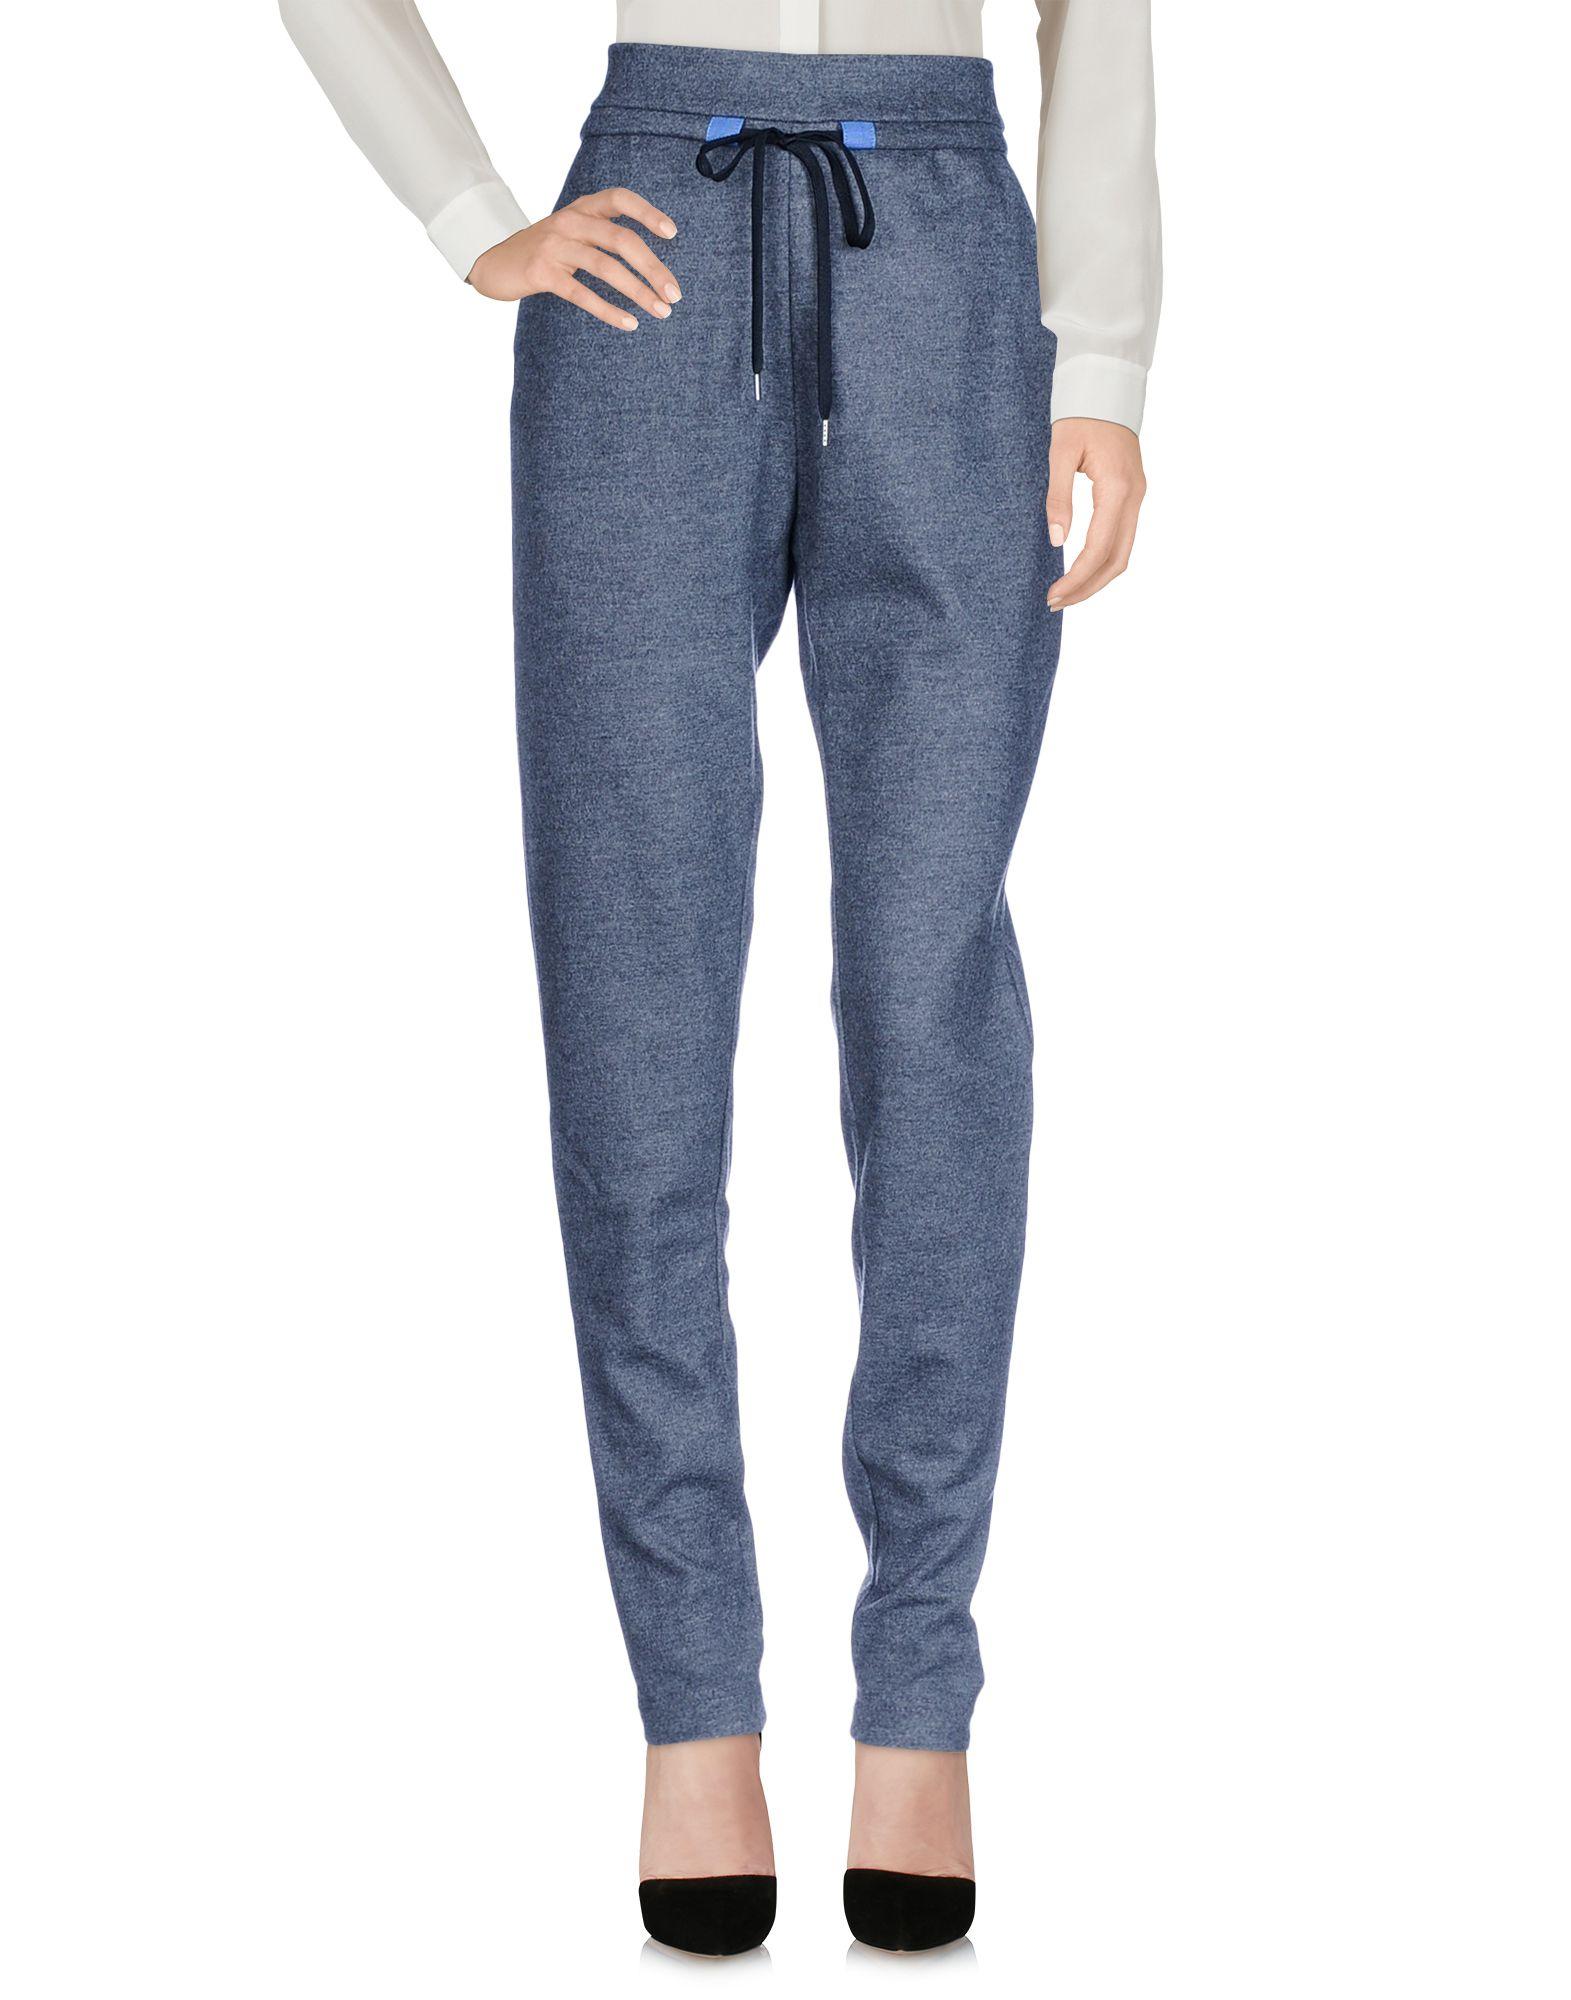 SAKAYORI. Casual Pants in Grey